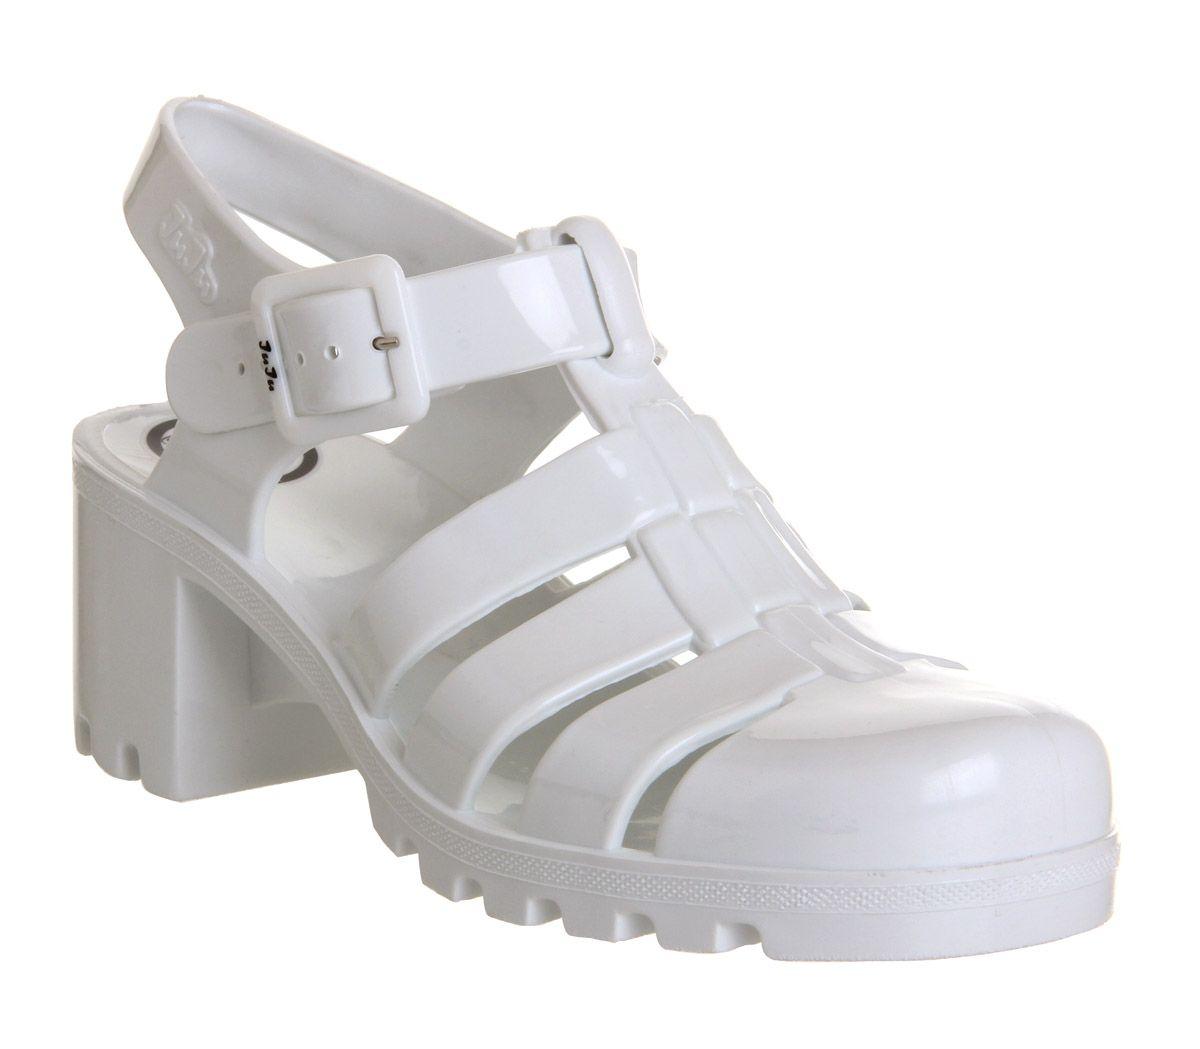 JuJu Babe Hi Jelly Shoes White - Sandals